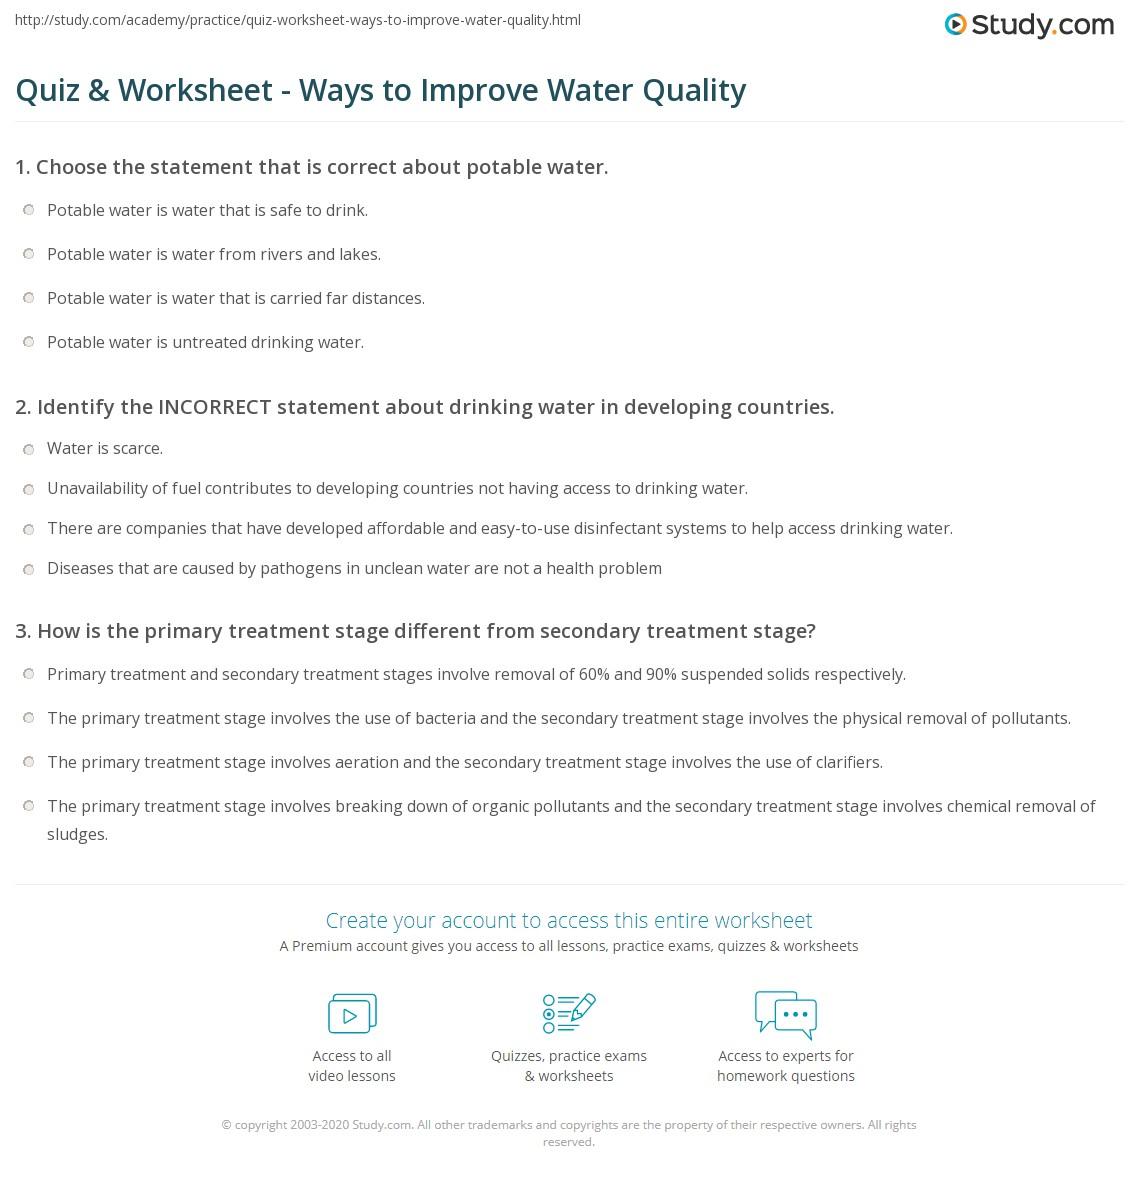 Quiz & Worksheet - Ways to Improve Water Quality | Study.com